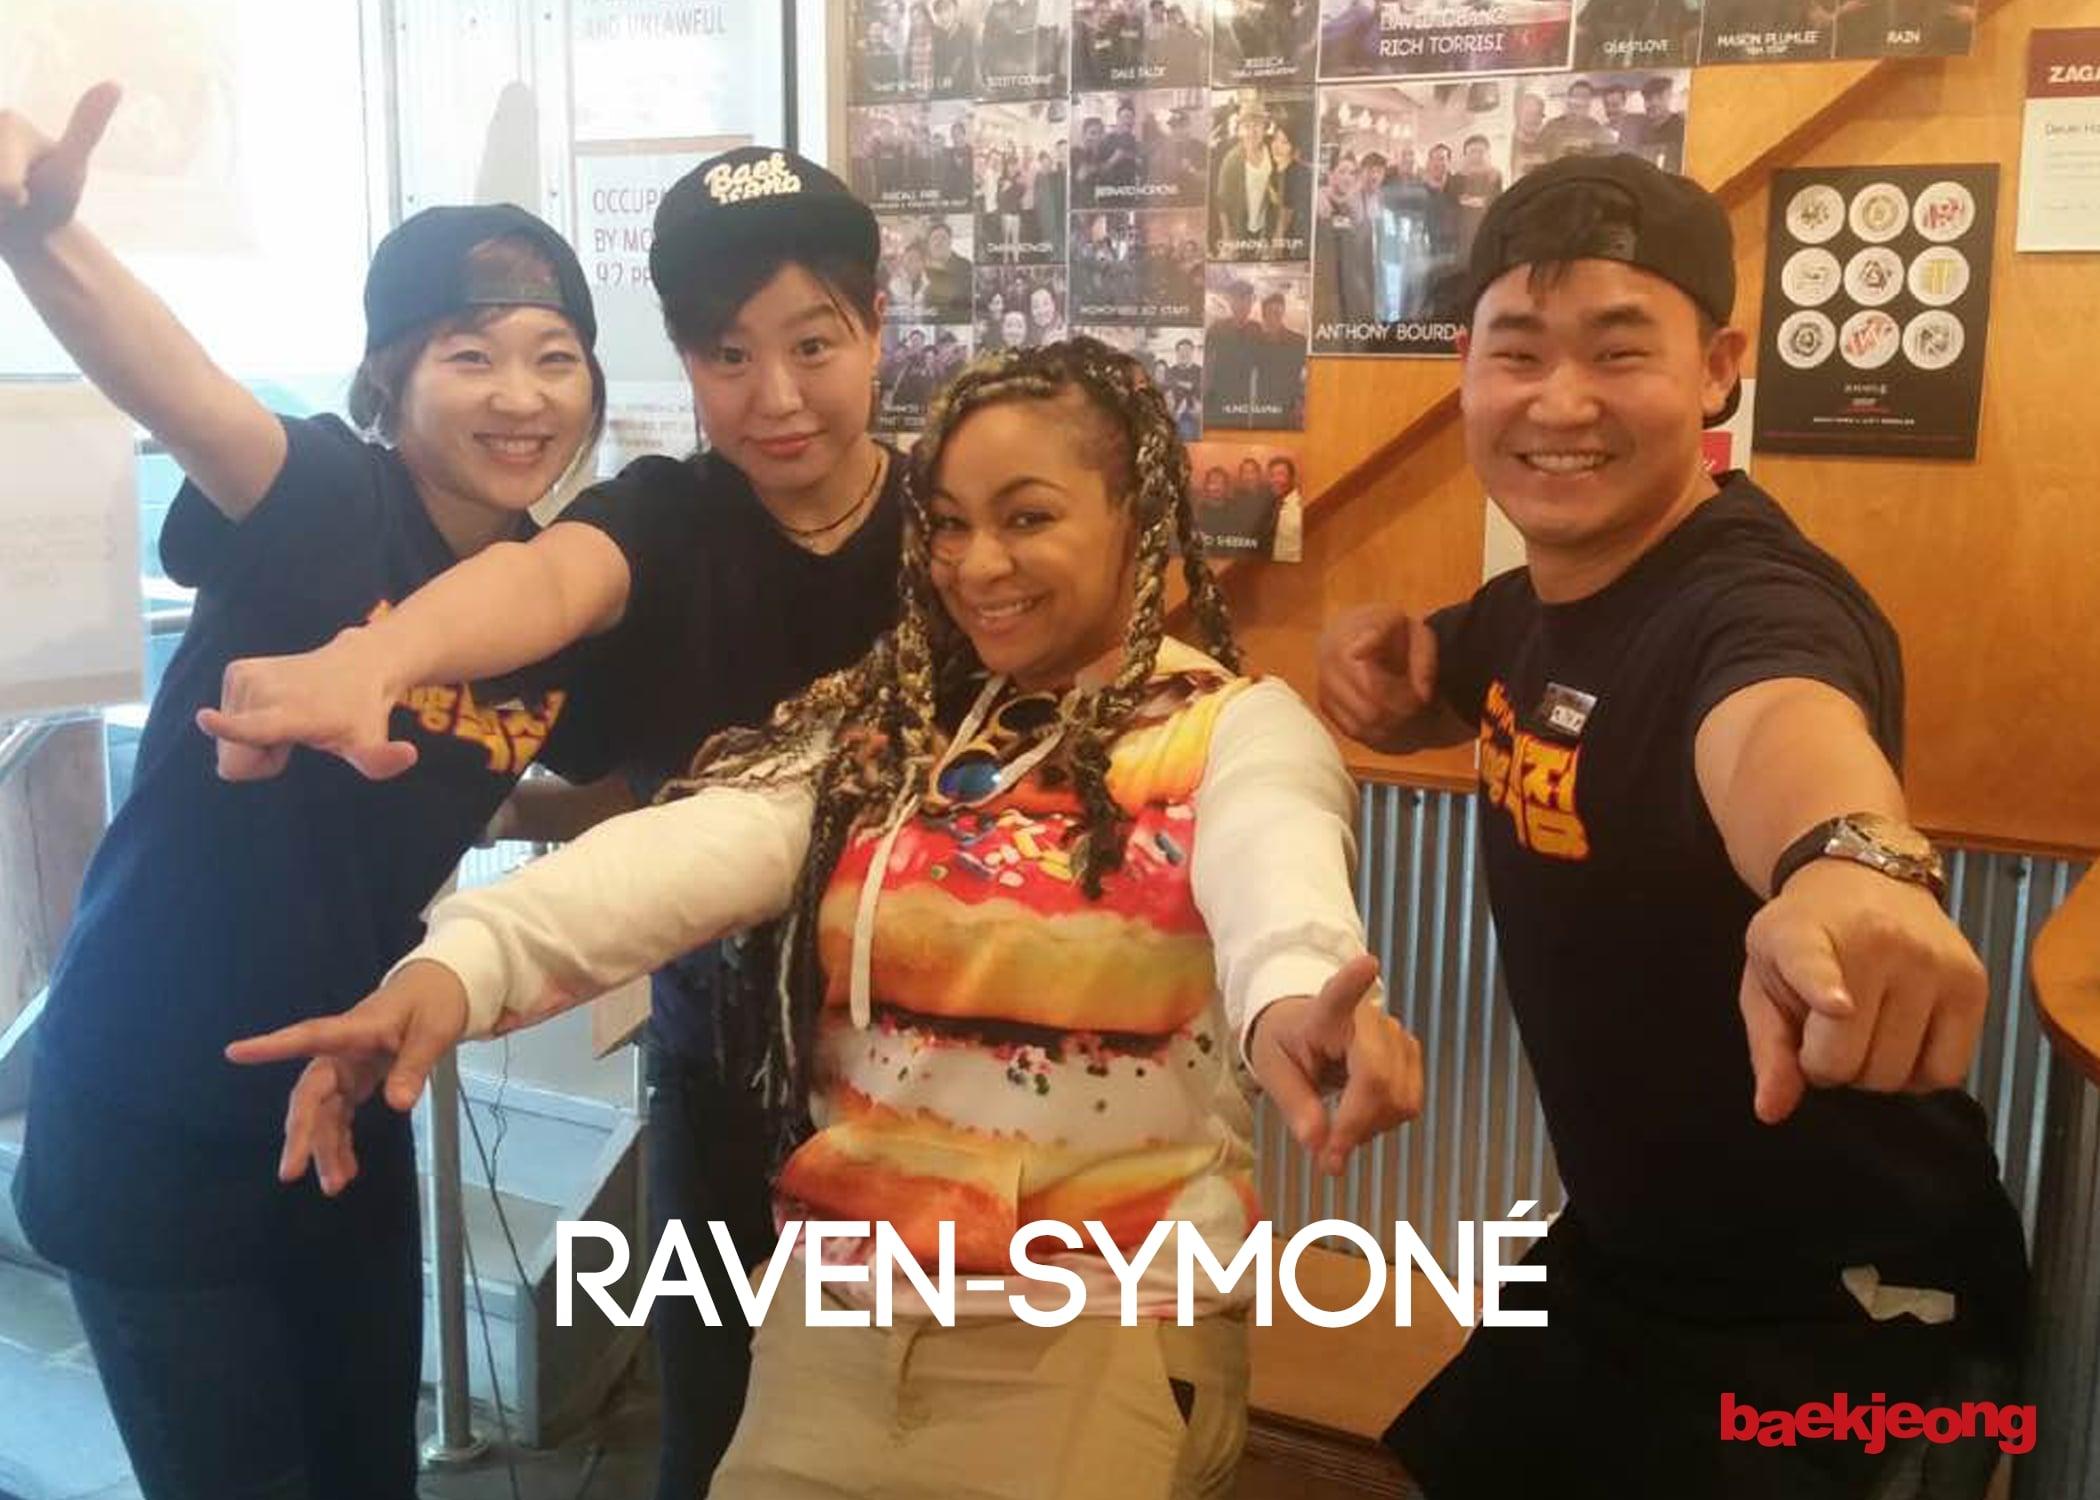 RavenSymone.jpg